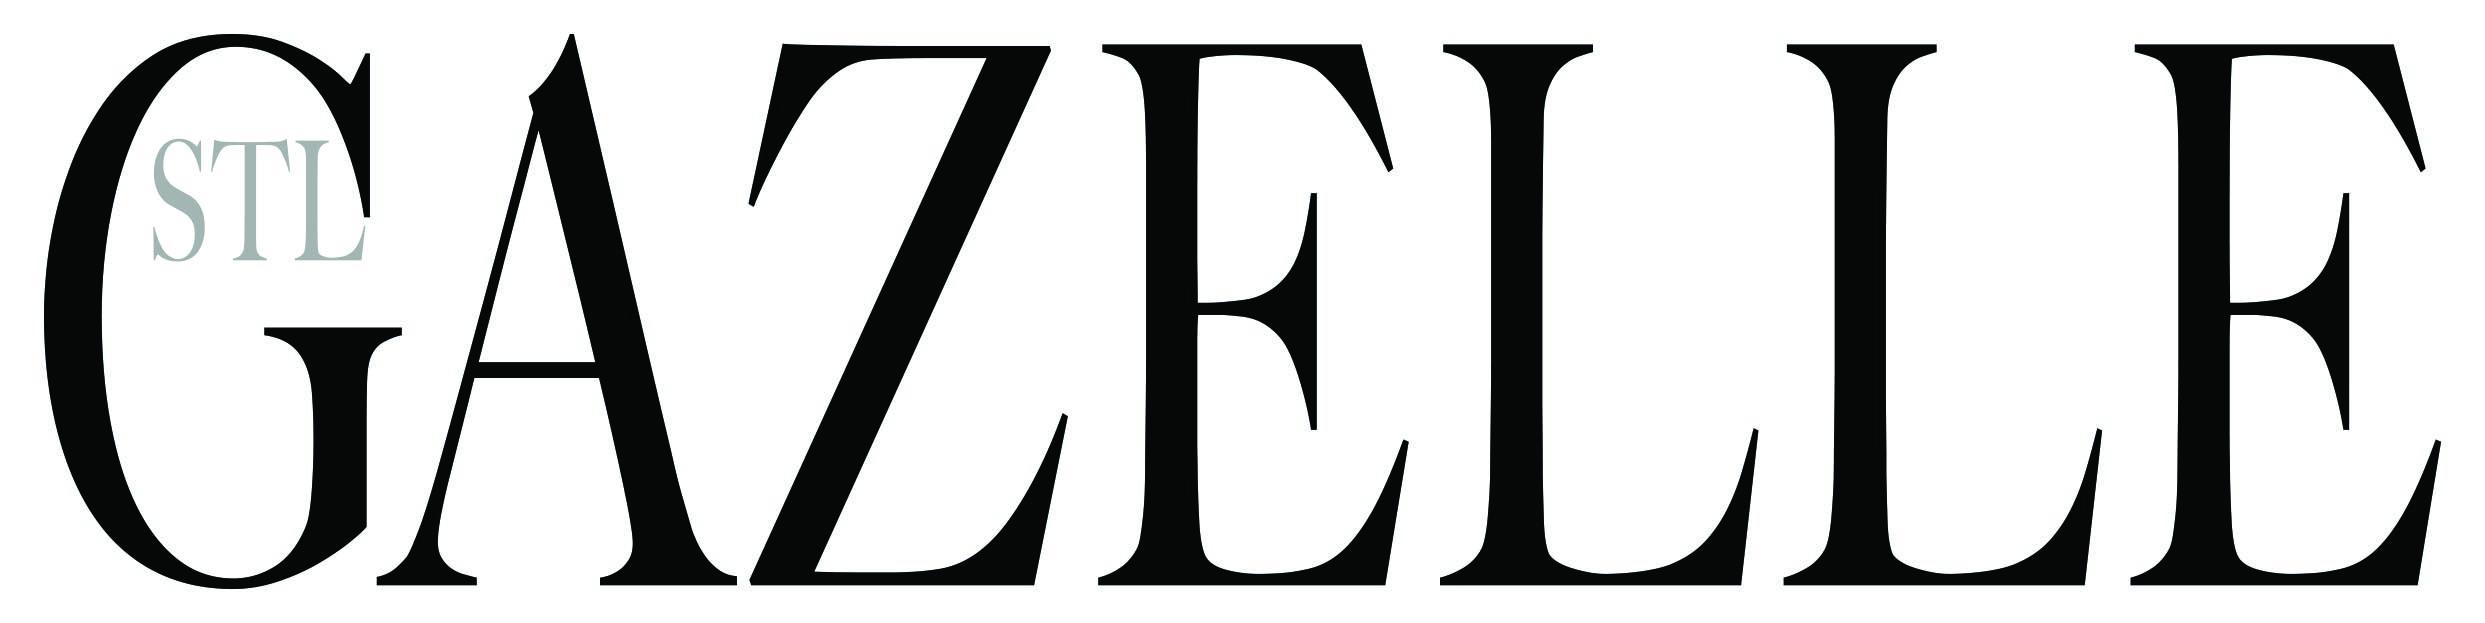 Gazelle-Stl-logo-1.jpg